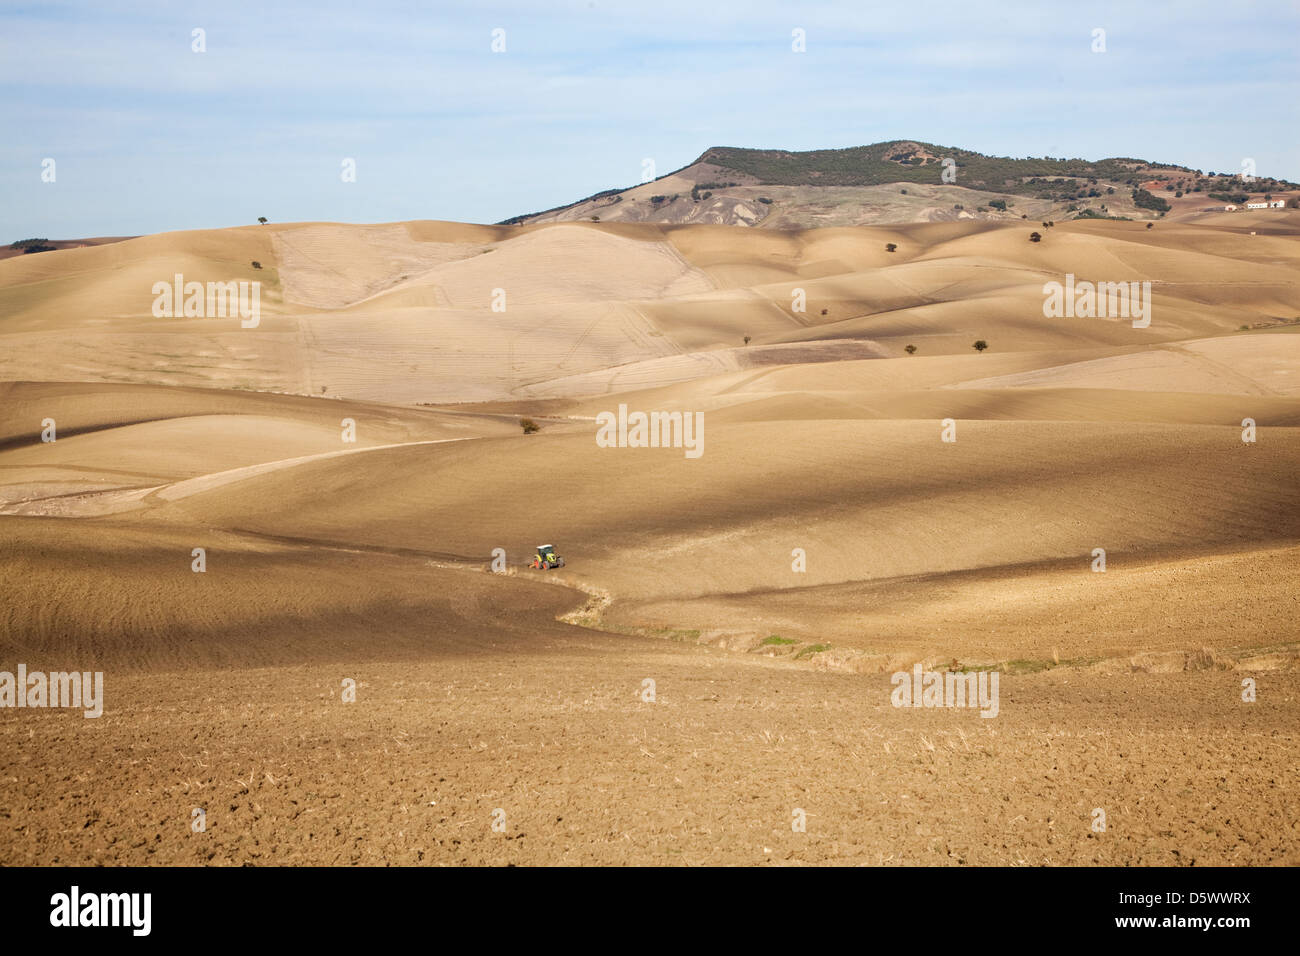 Dirt road in dry rural landscape - Stock Image